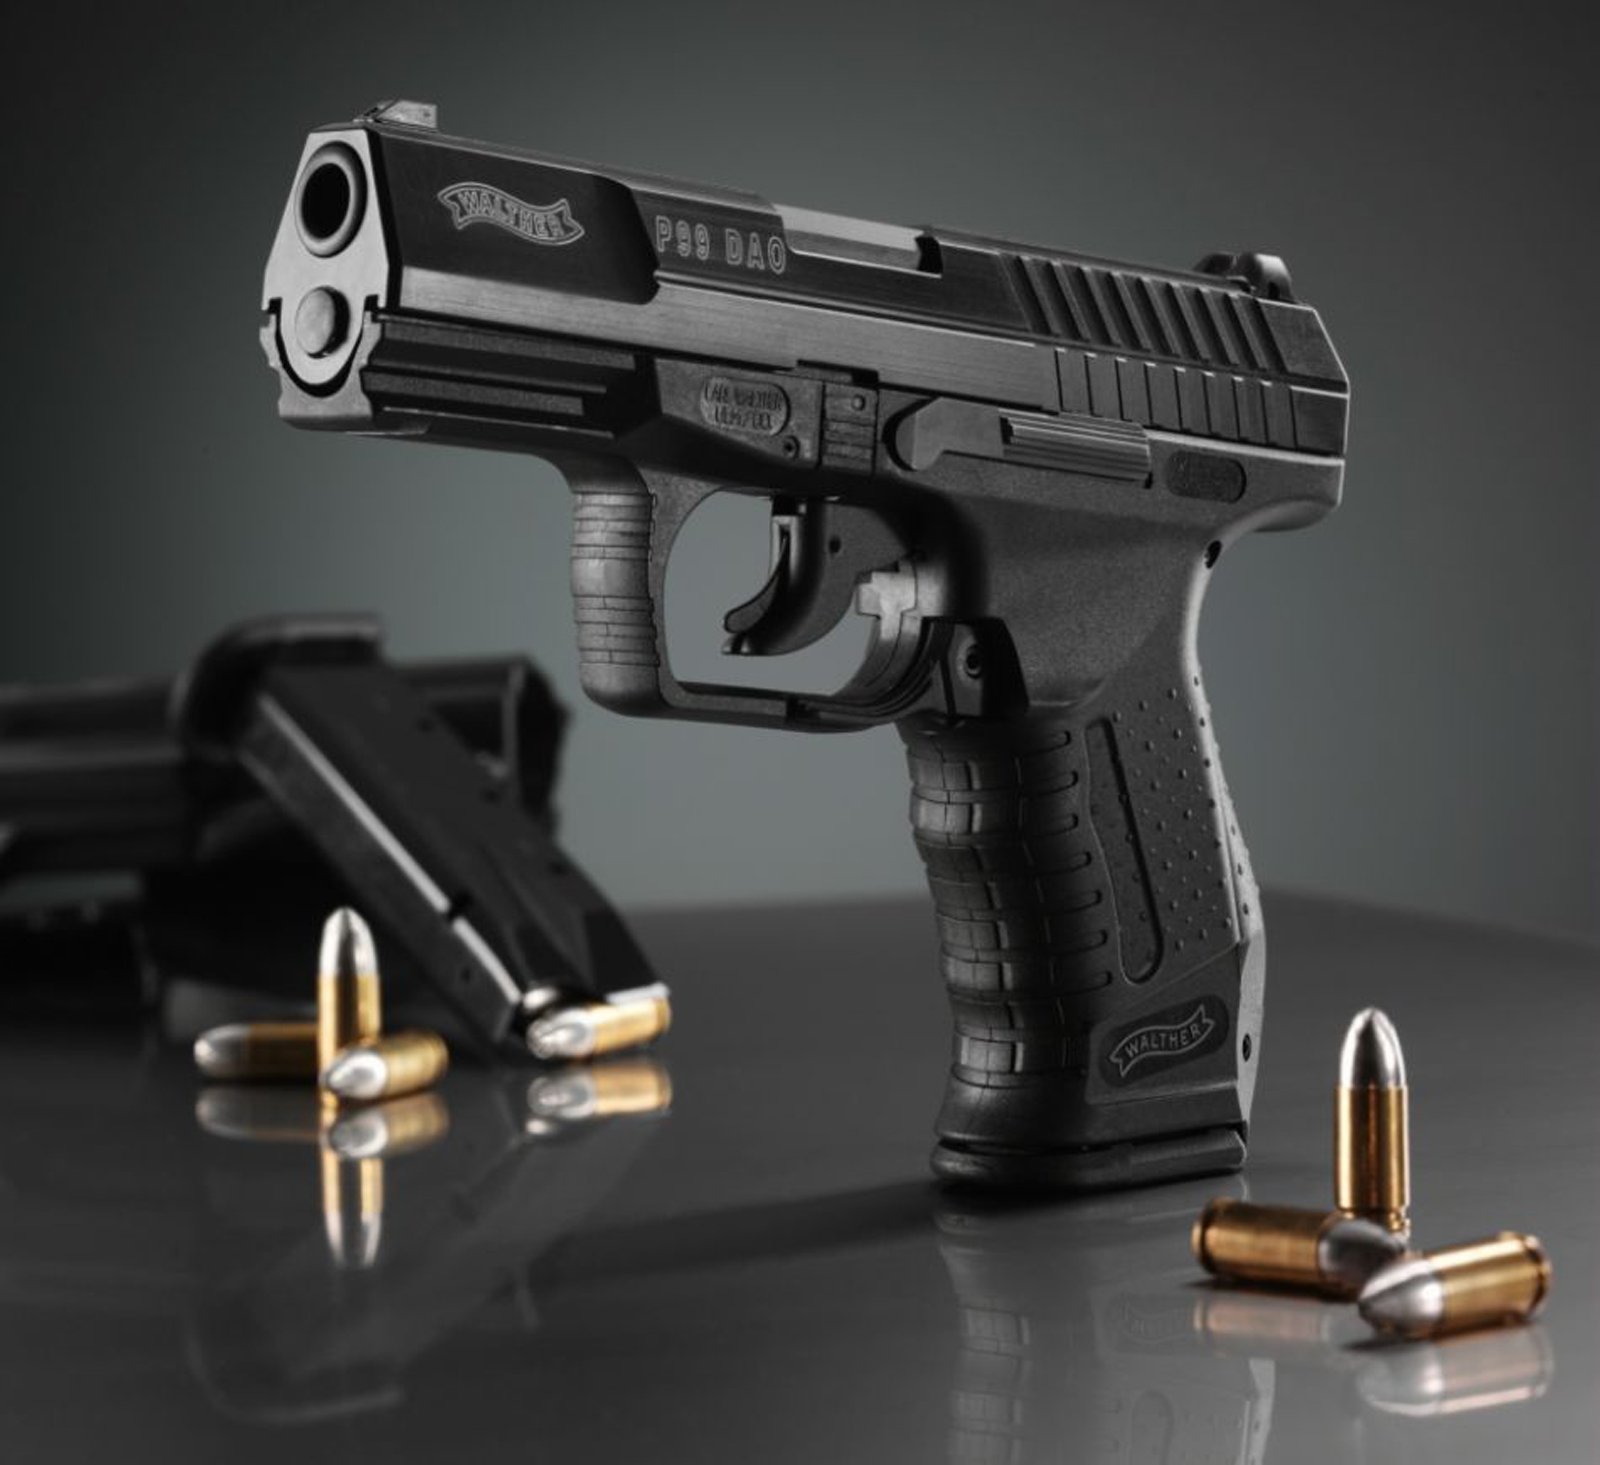 Wallpaper download gun - Walther P 99 As Hd Gun Wallpapers Download Free Wallpapers In Hd For